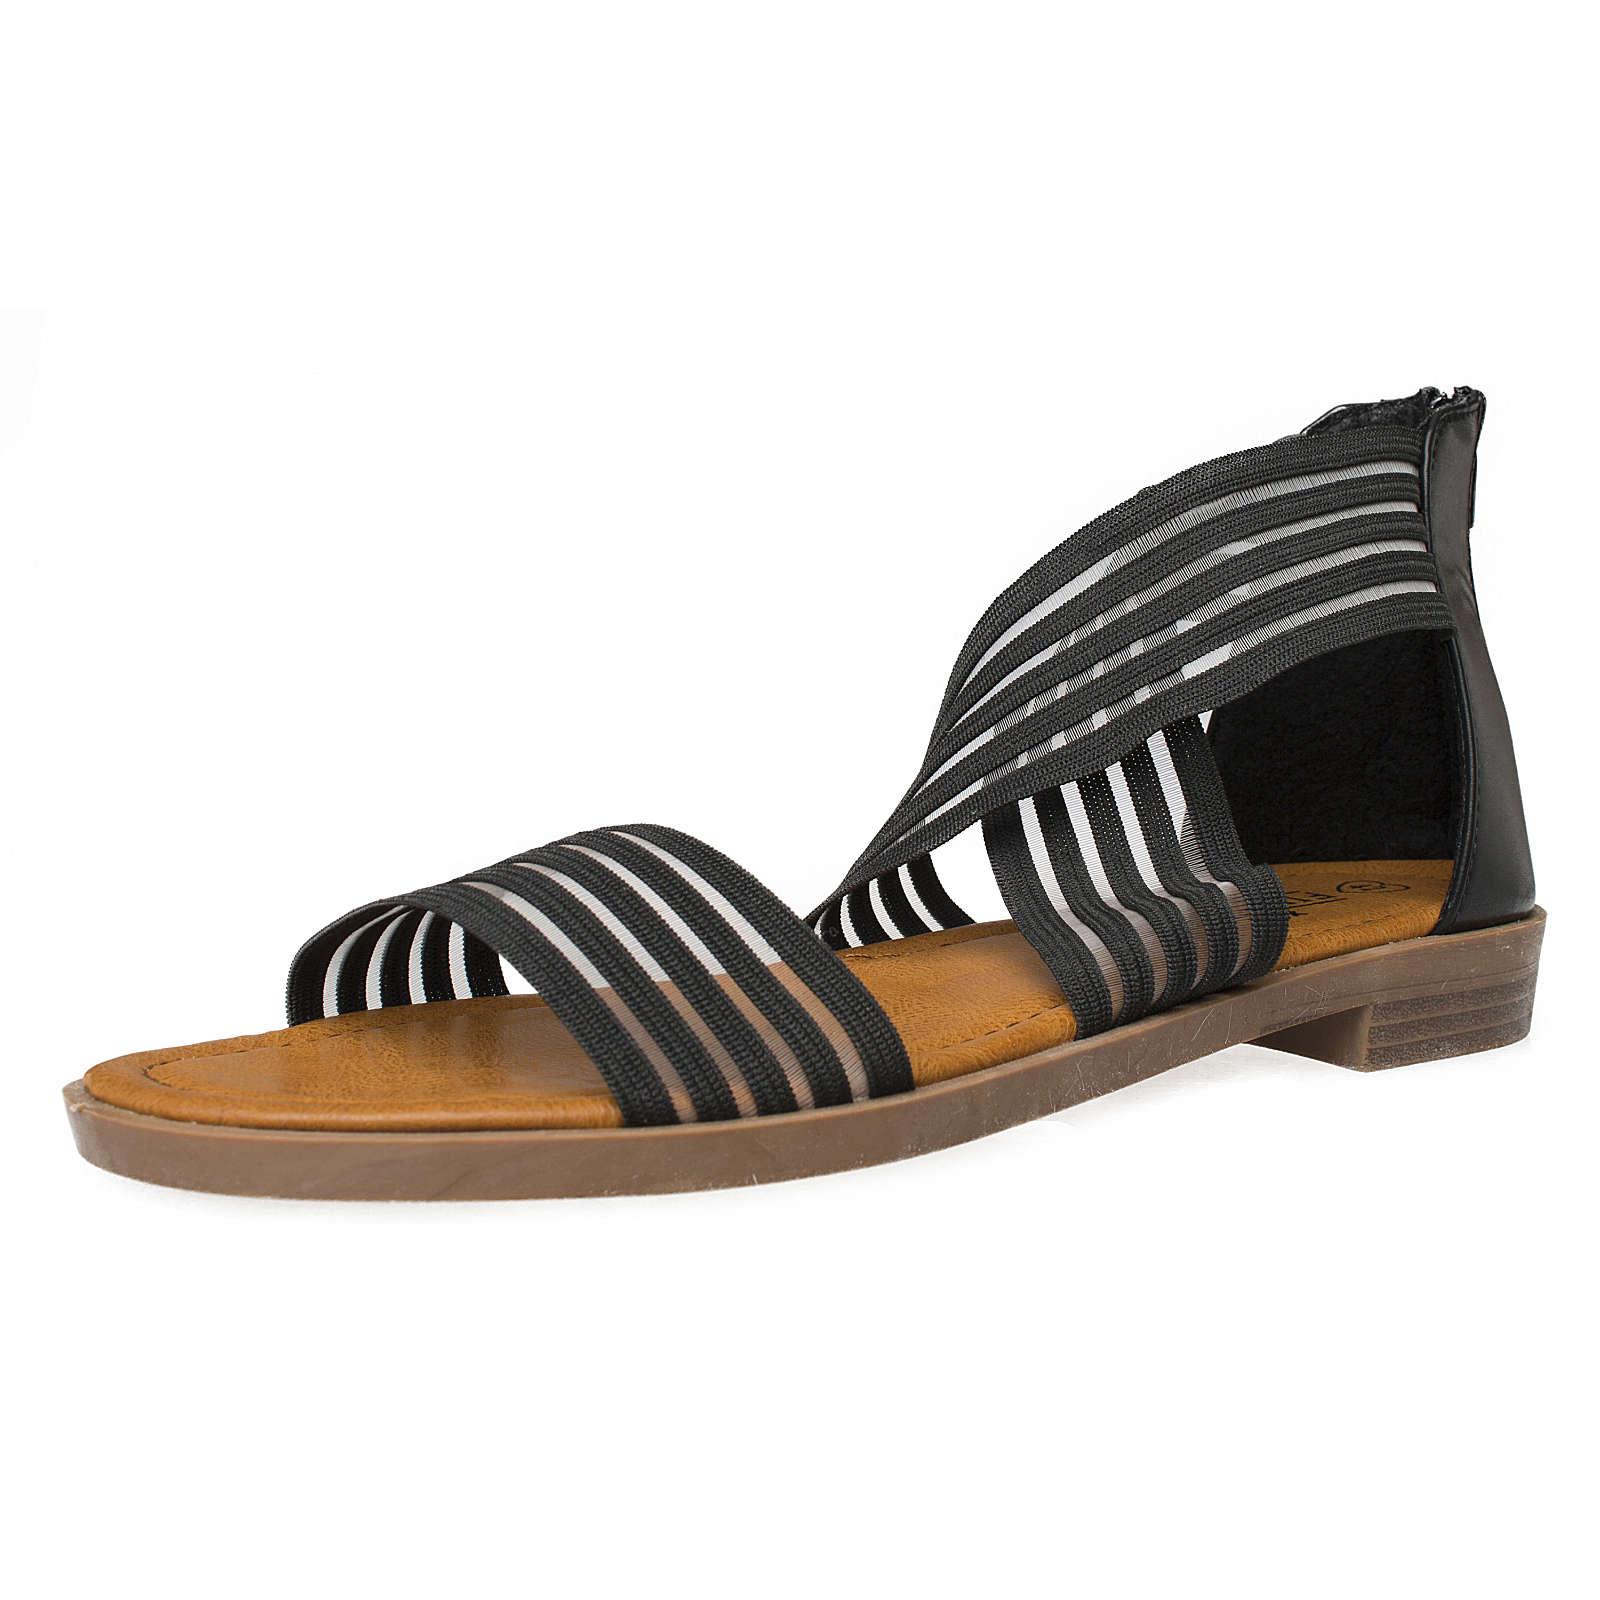 Fitters Footwear That Fits Sandale Christina Klassische Sandalen schwarz Damen Gr. 44